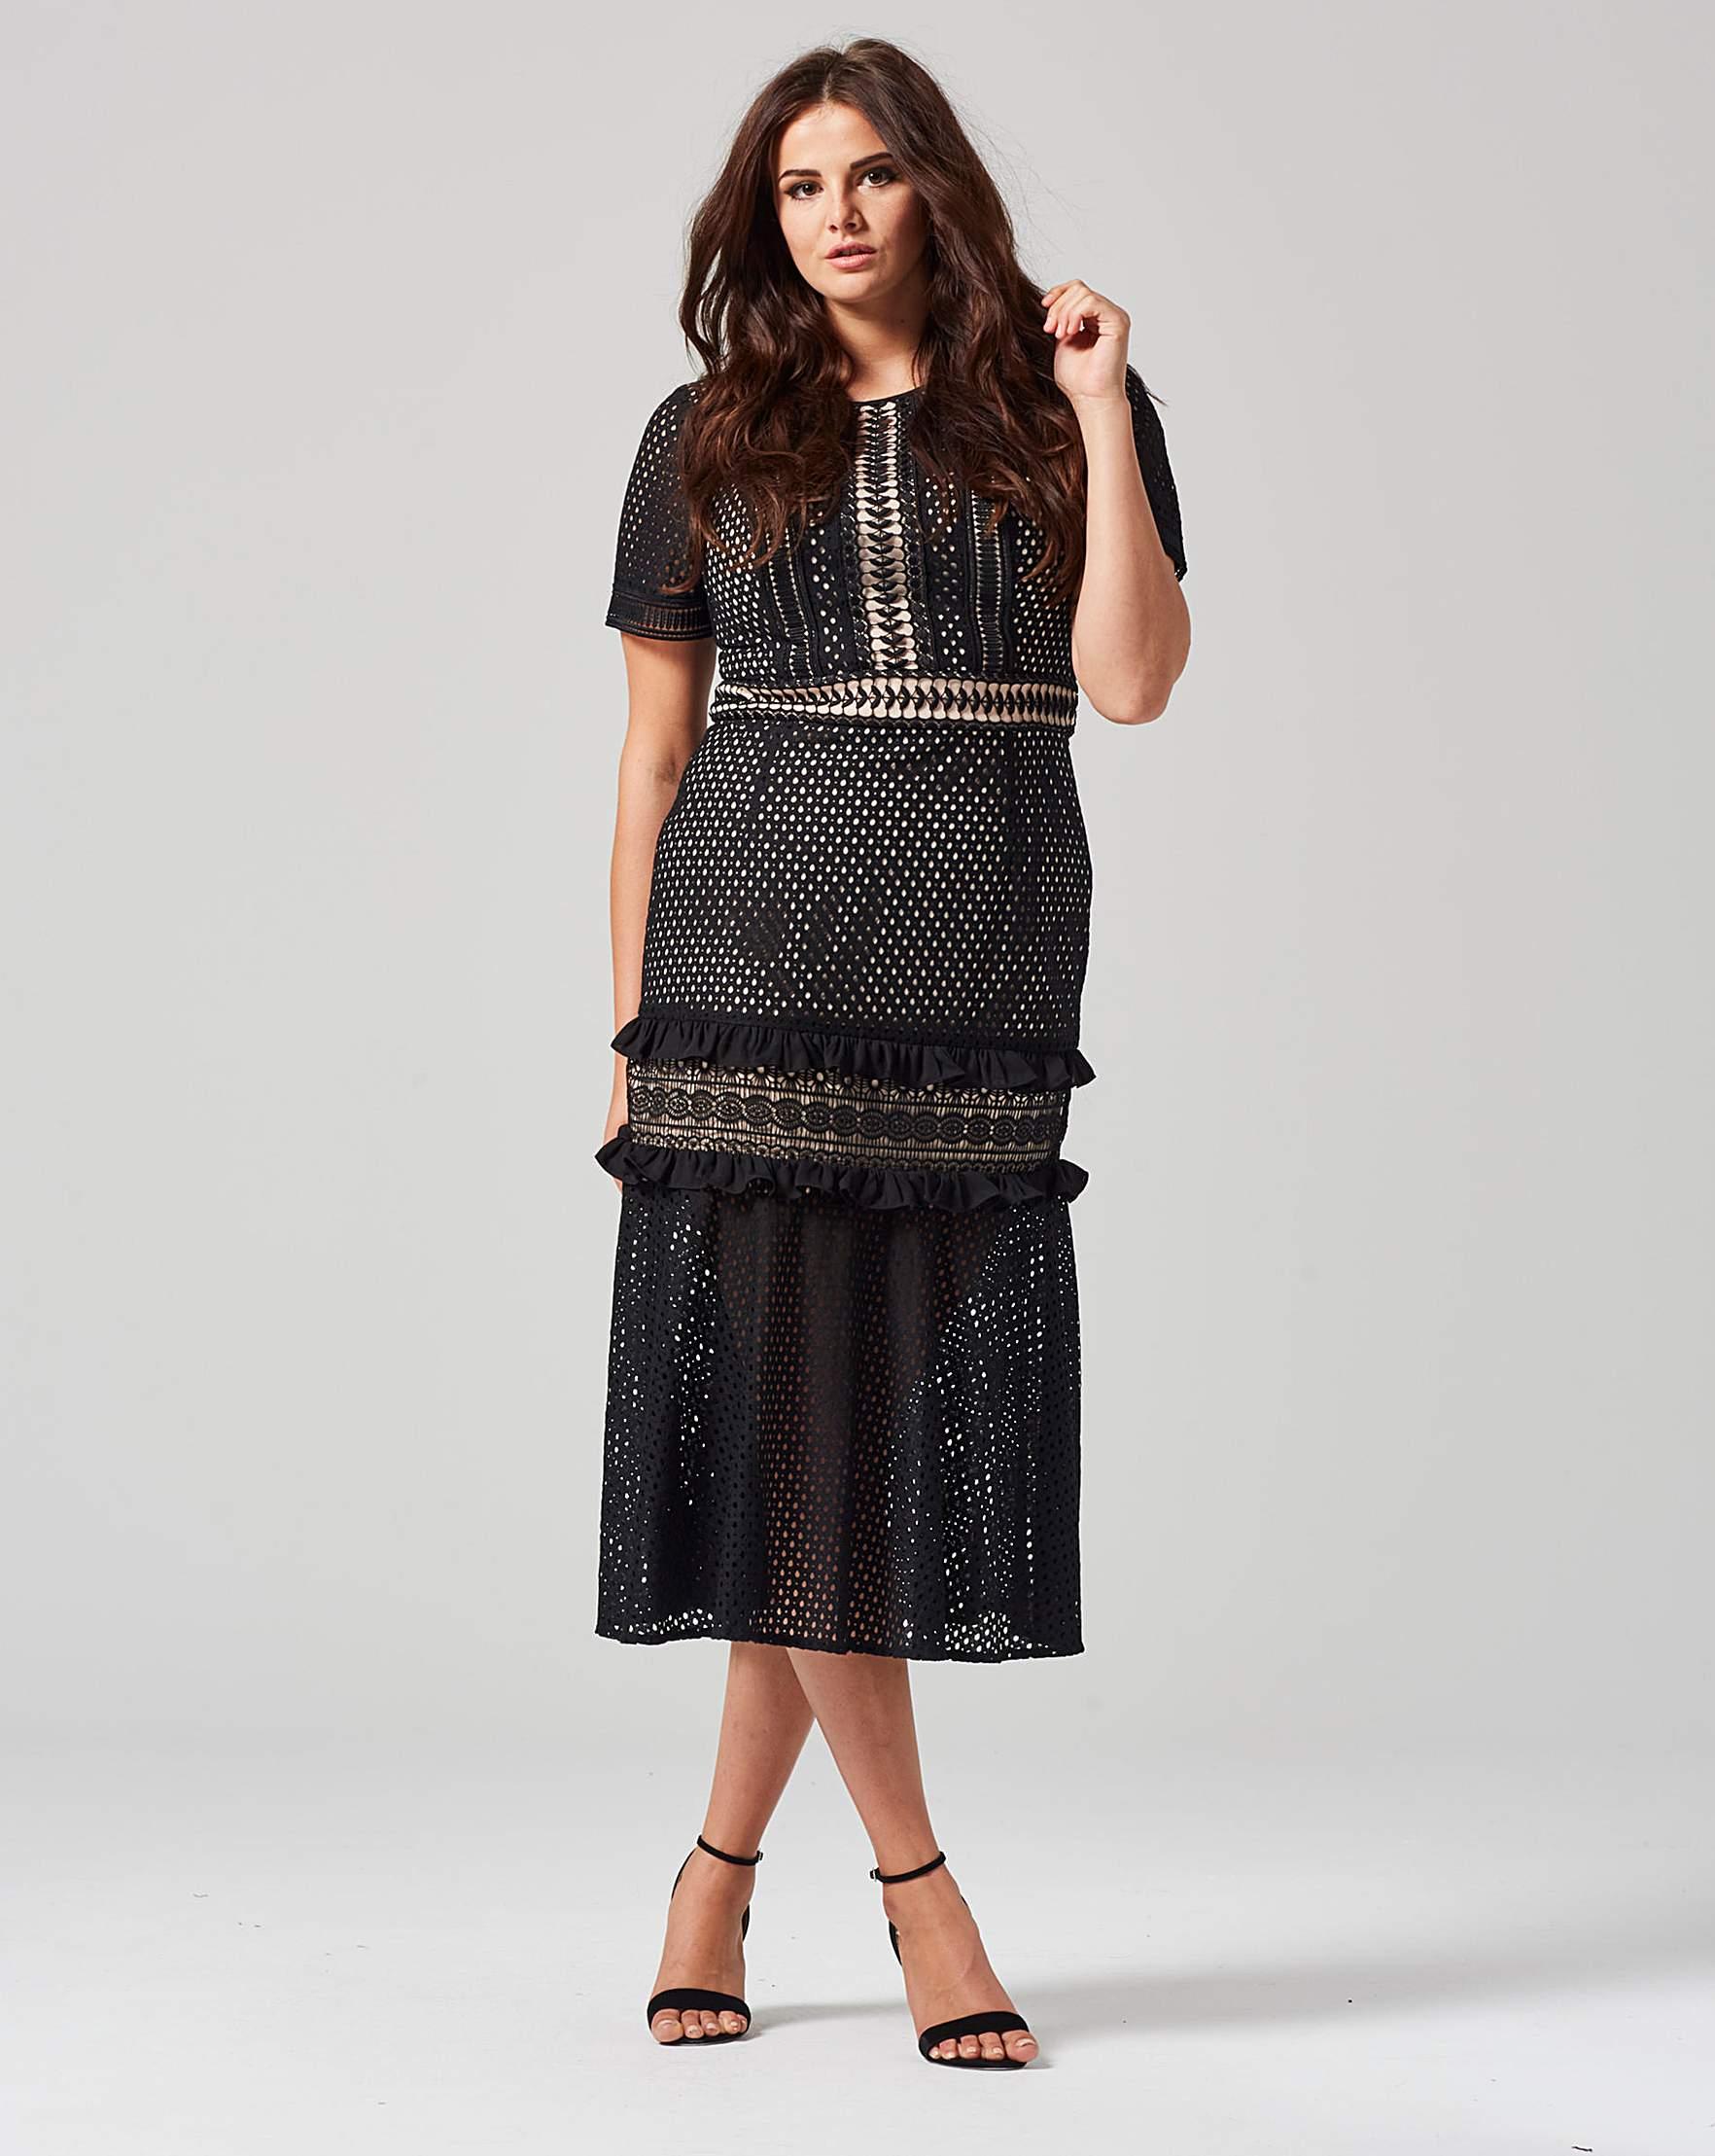 86e9e2c198a Truly You Lace Detail Dress | Simply Be